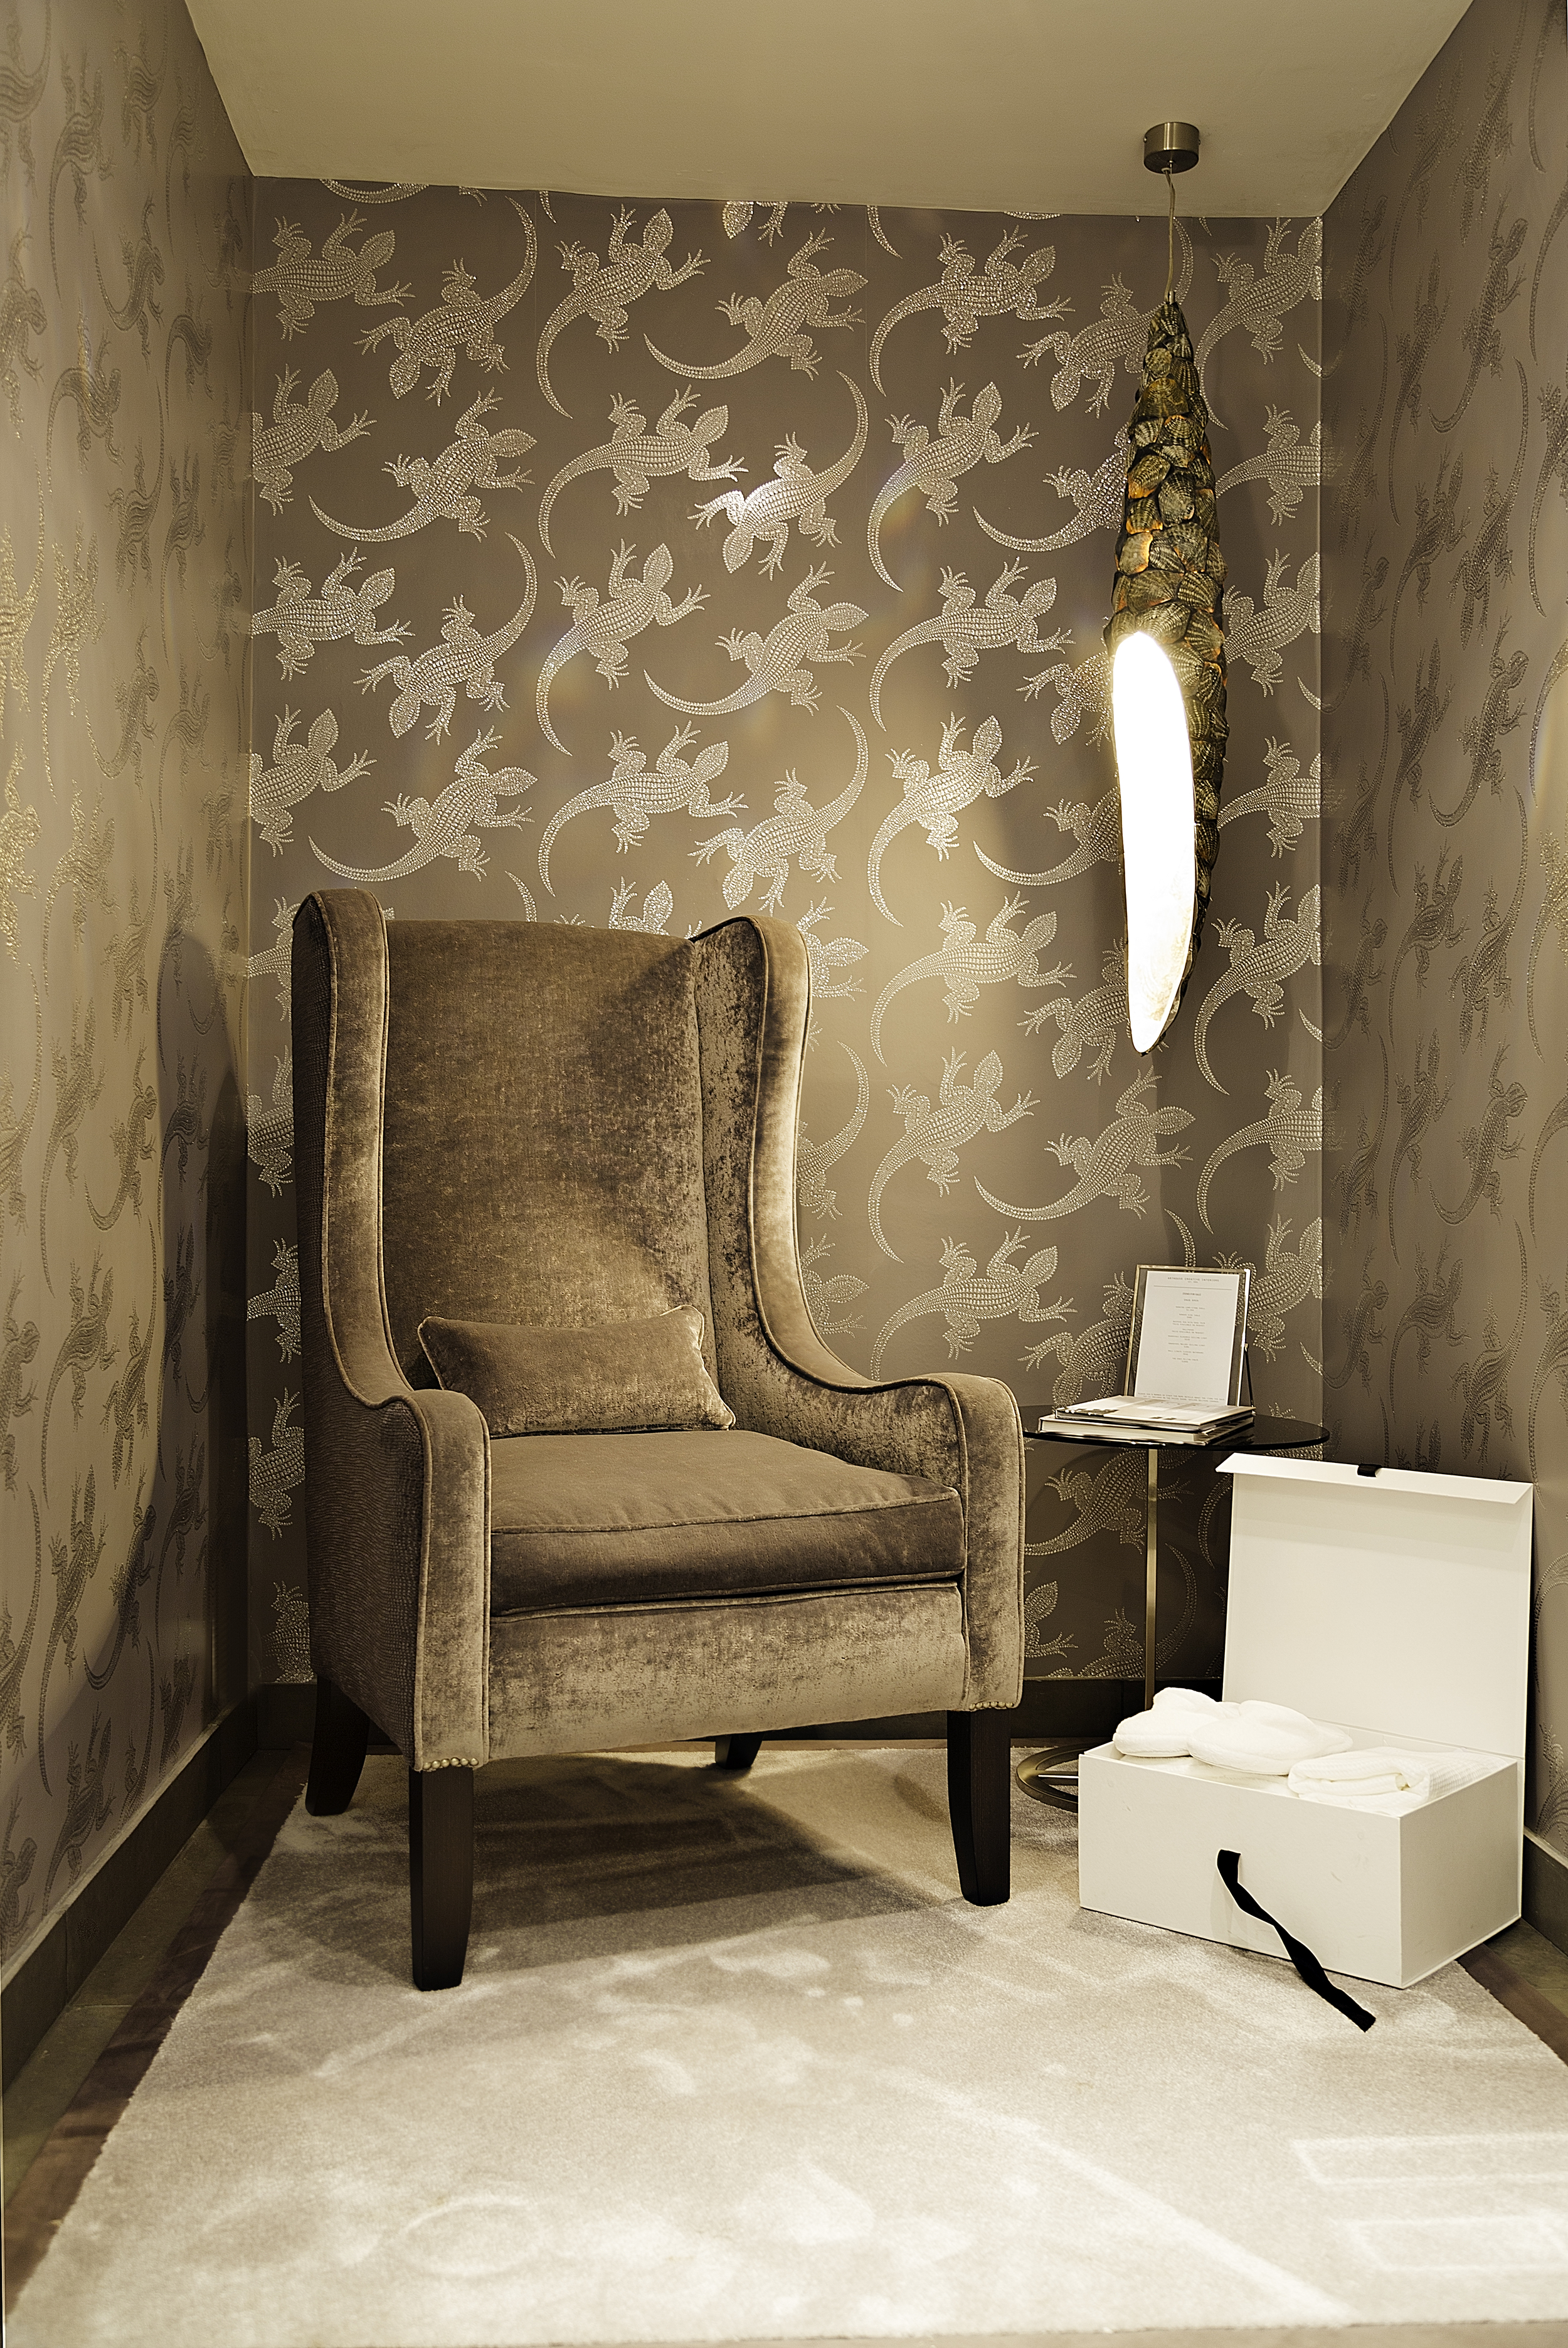 Designer chair in study